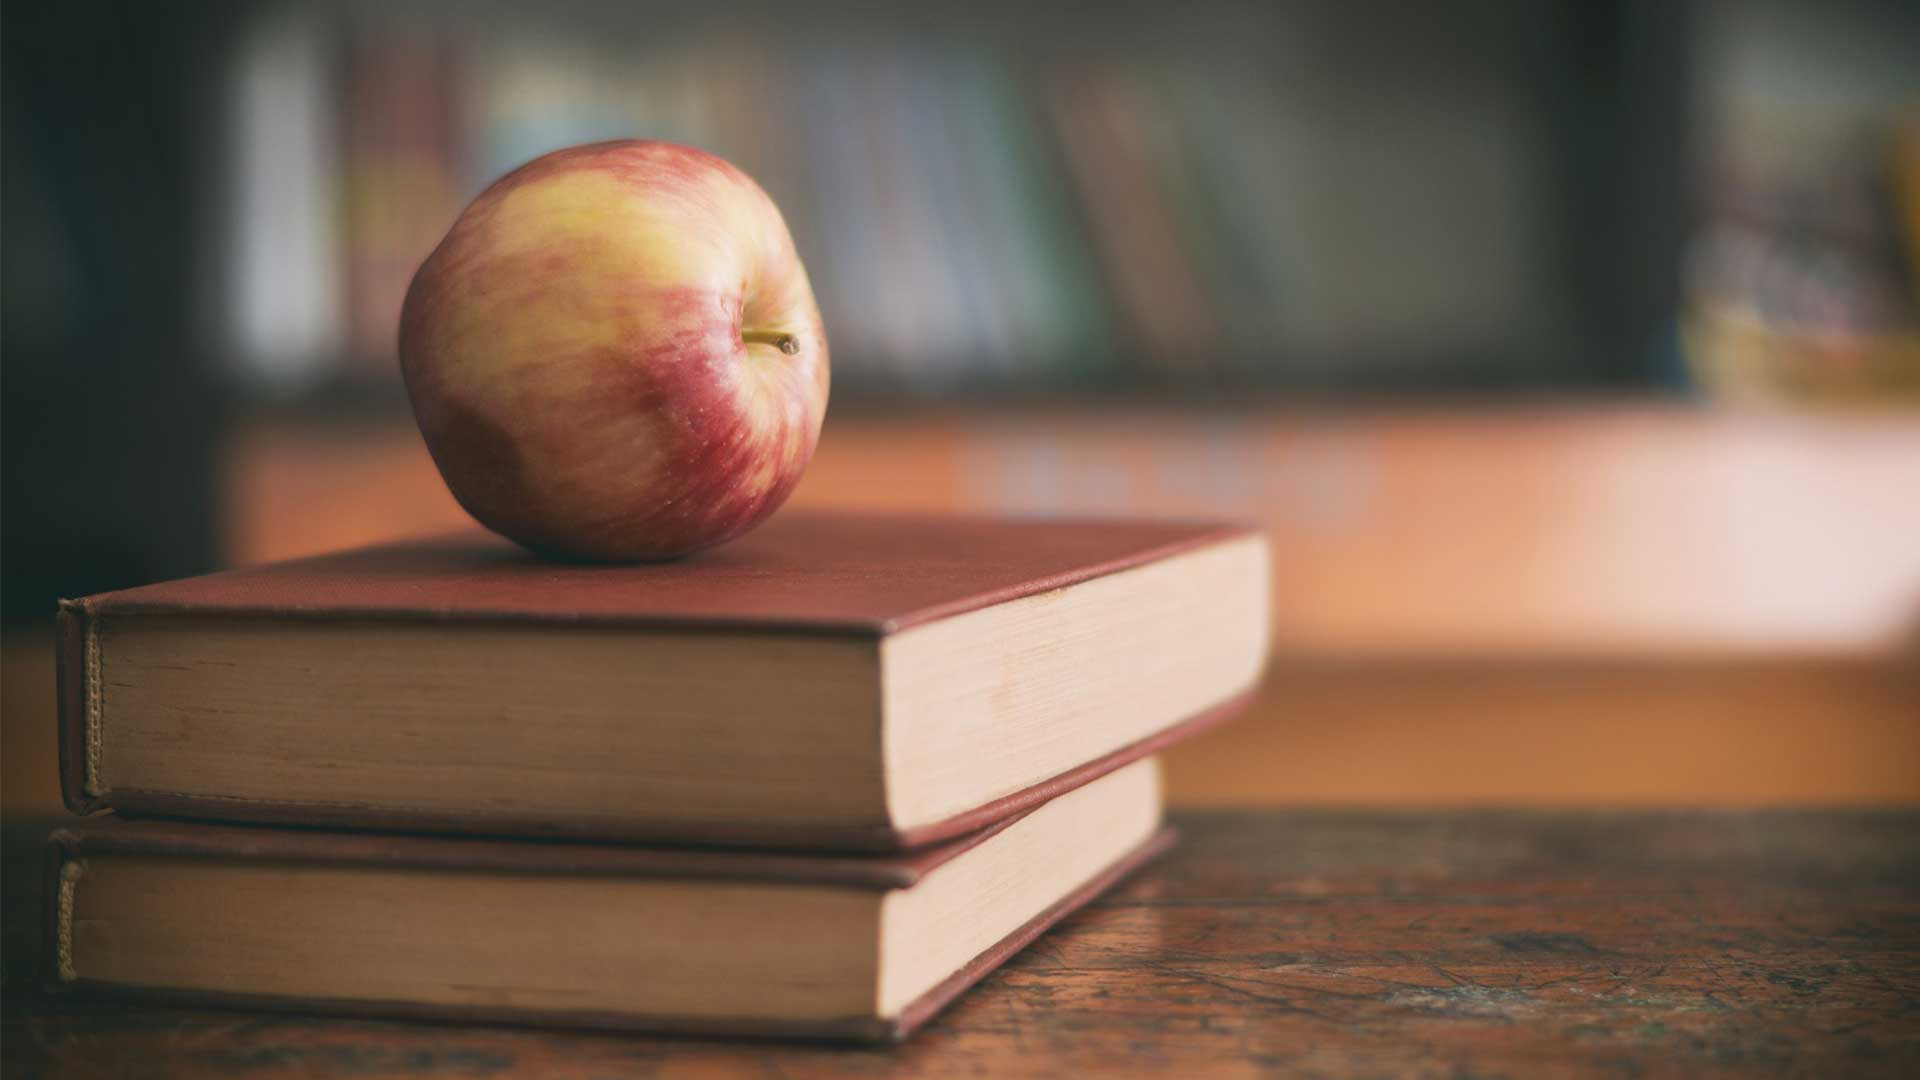 mad-scuola-requisiti